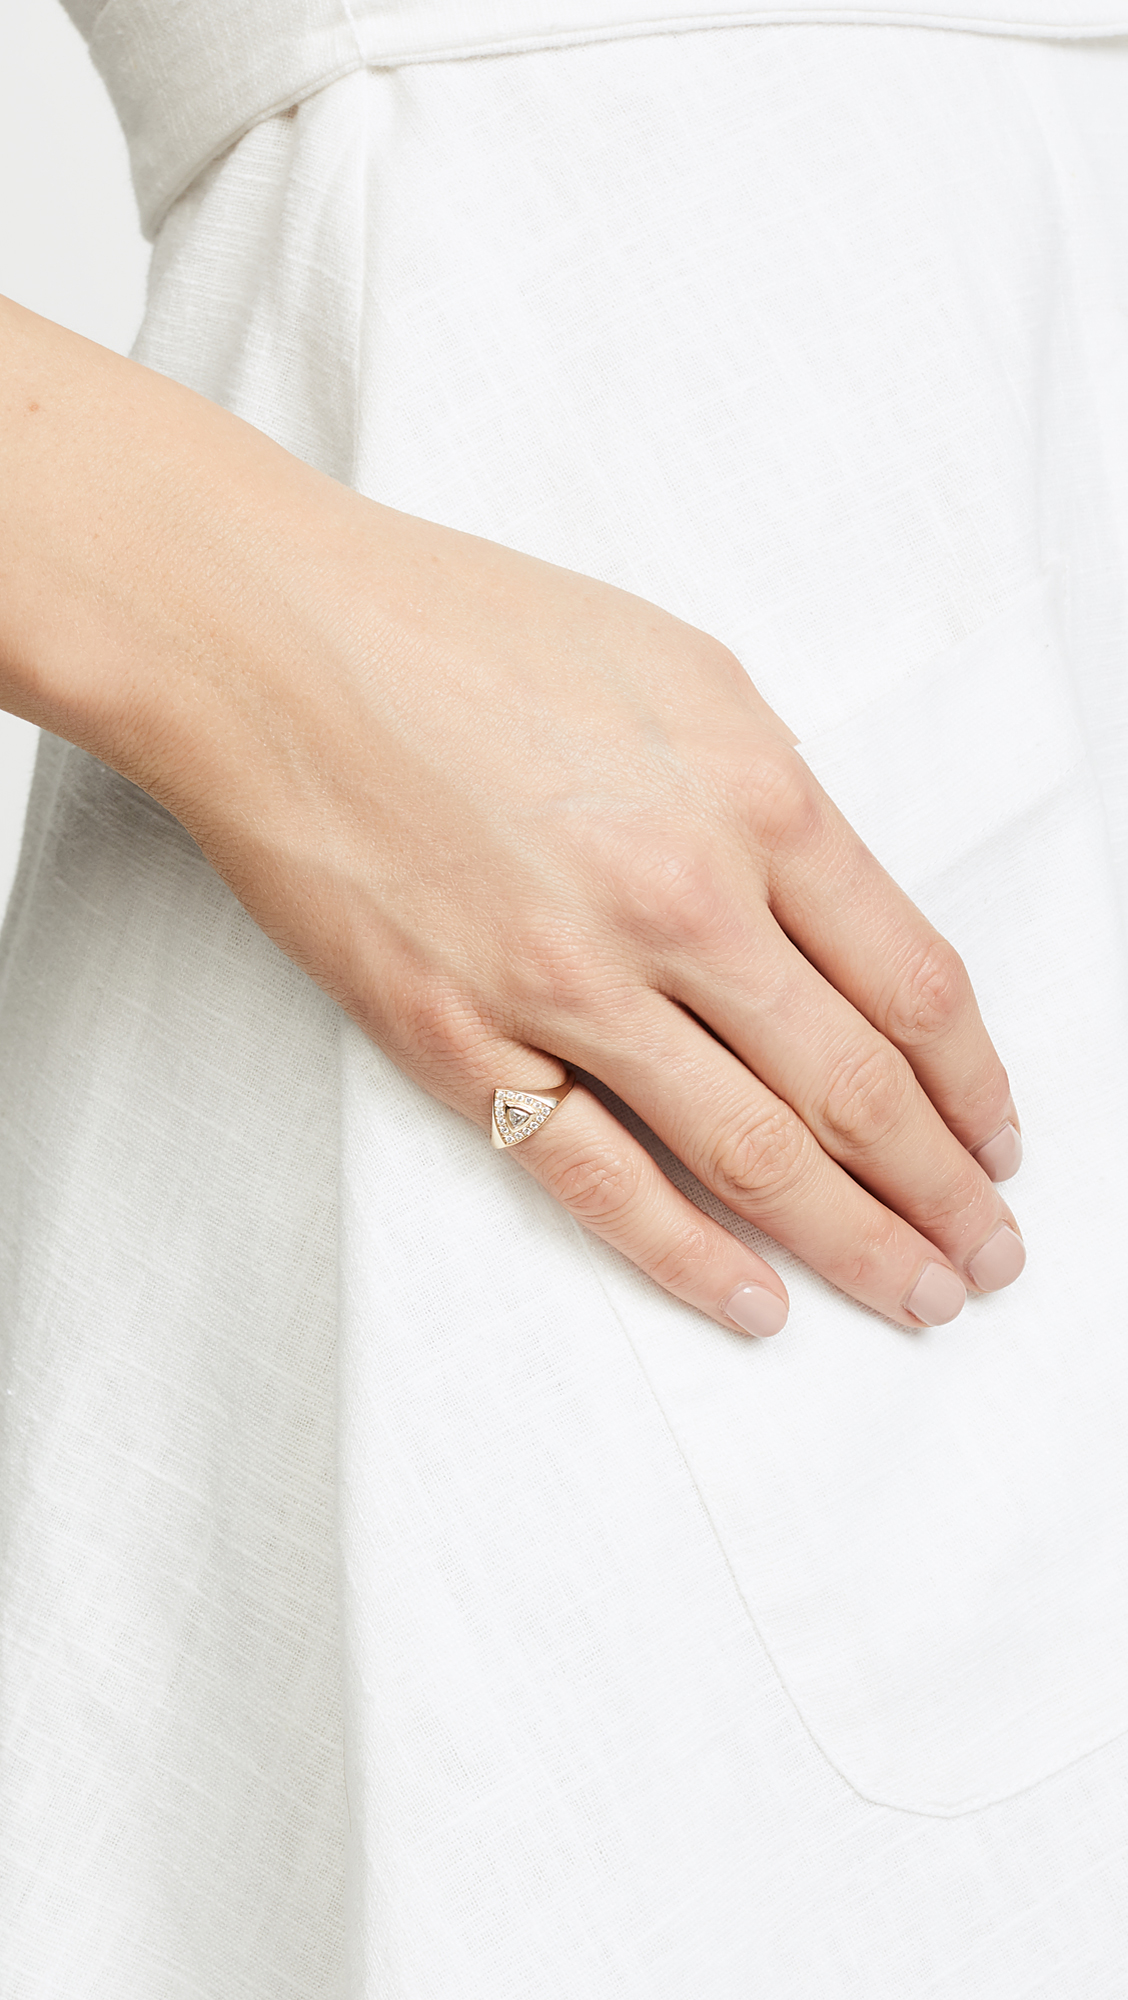 Zoë Chicco 14k Gold Trillion Signet Pinky Ring UrpqbDmBIz